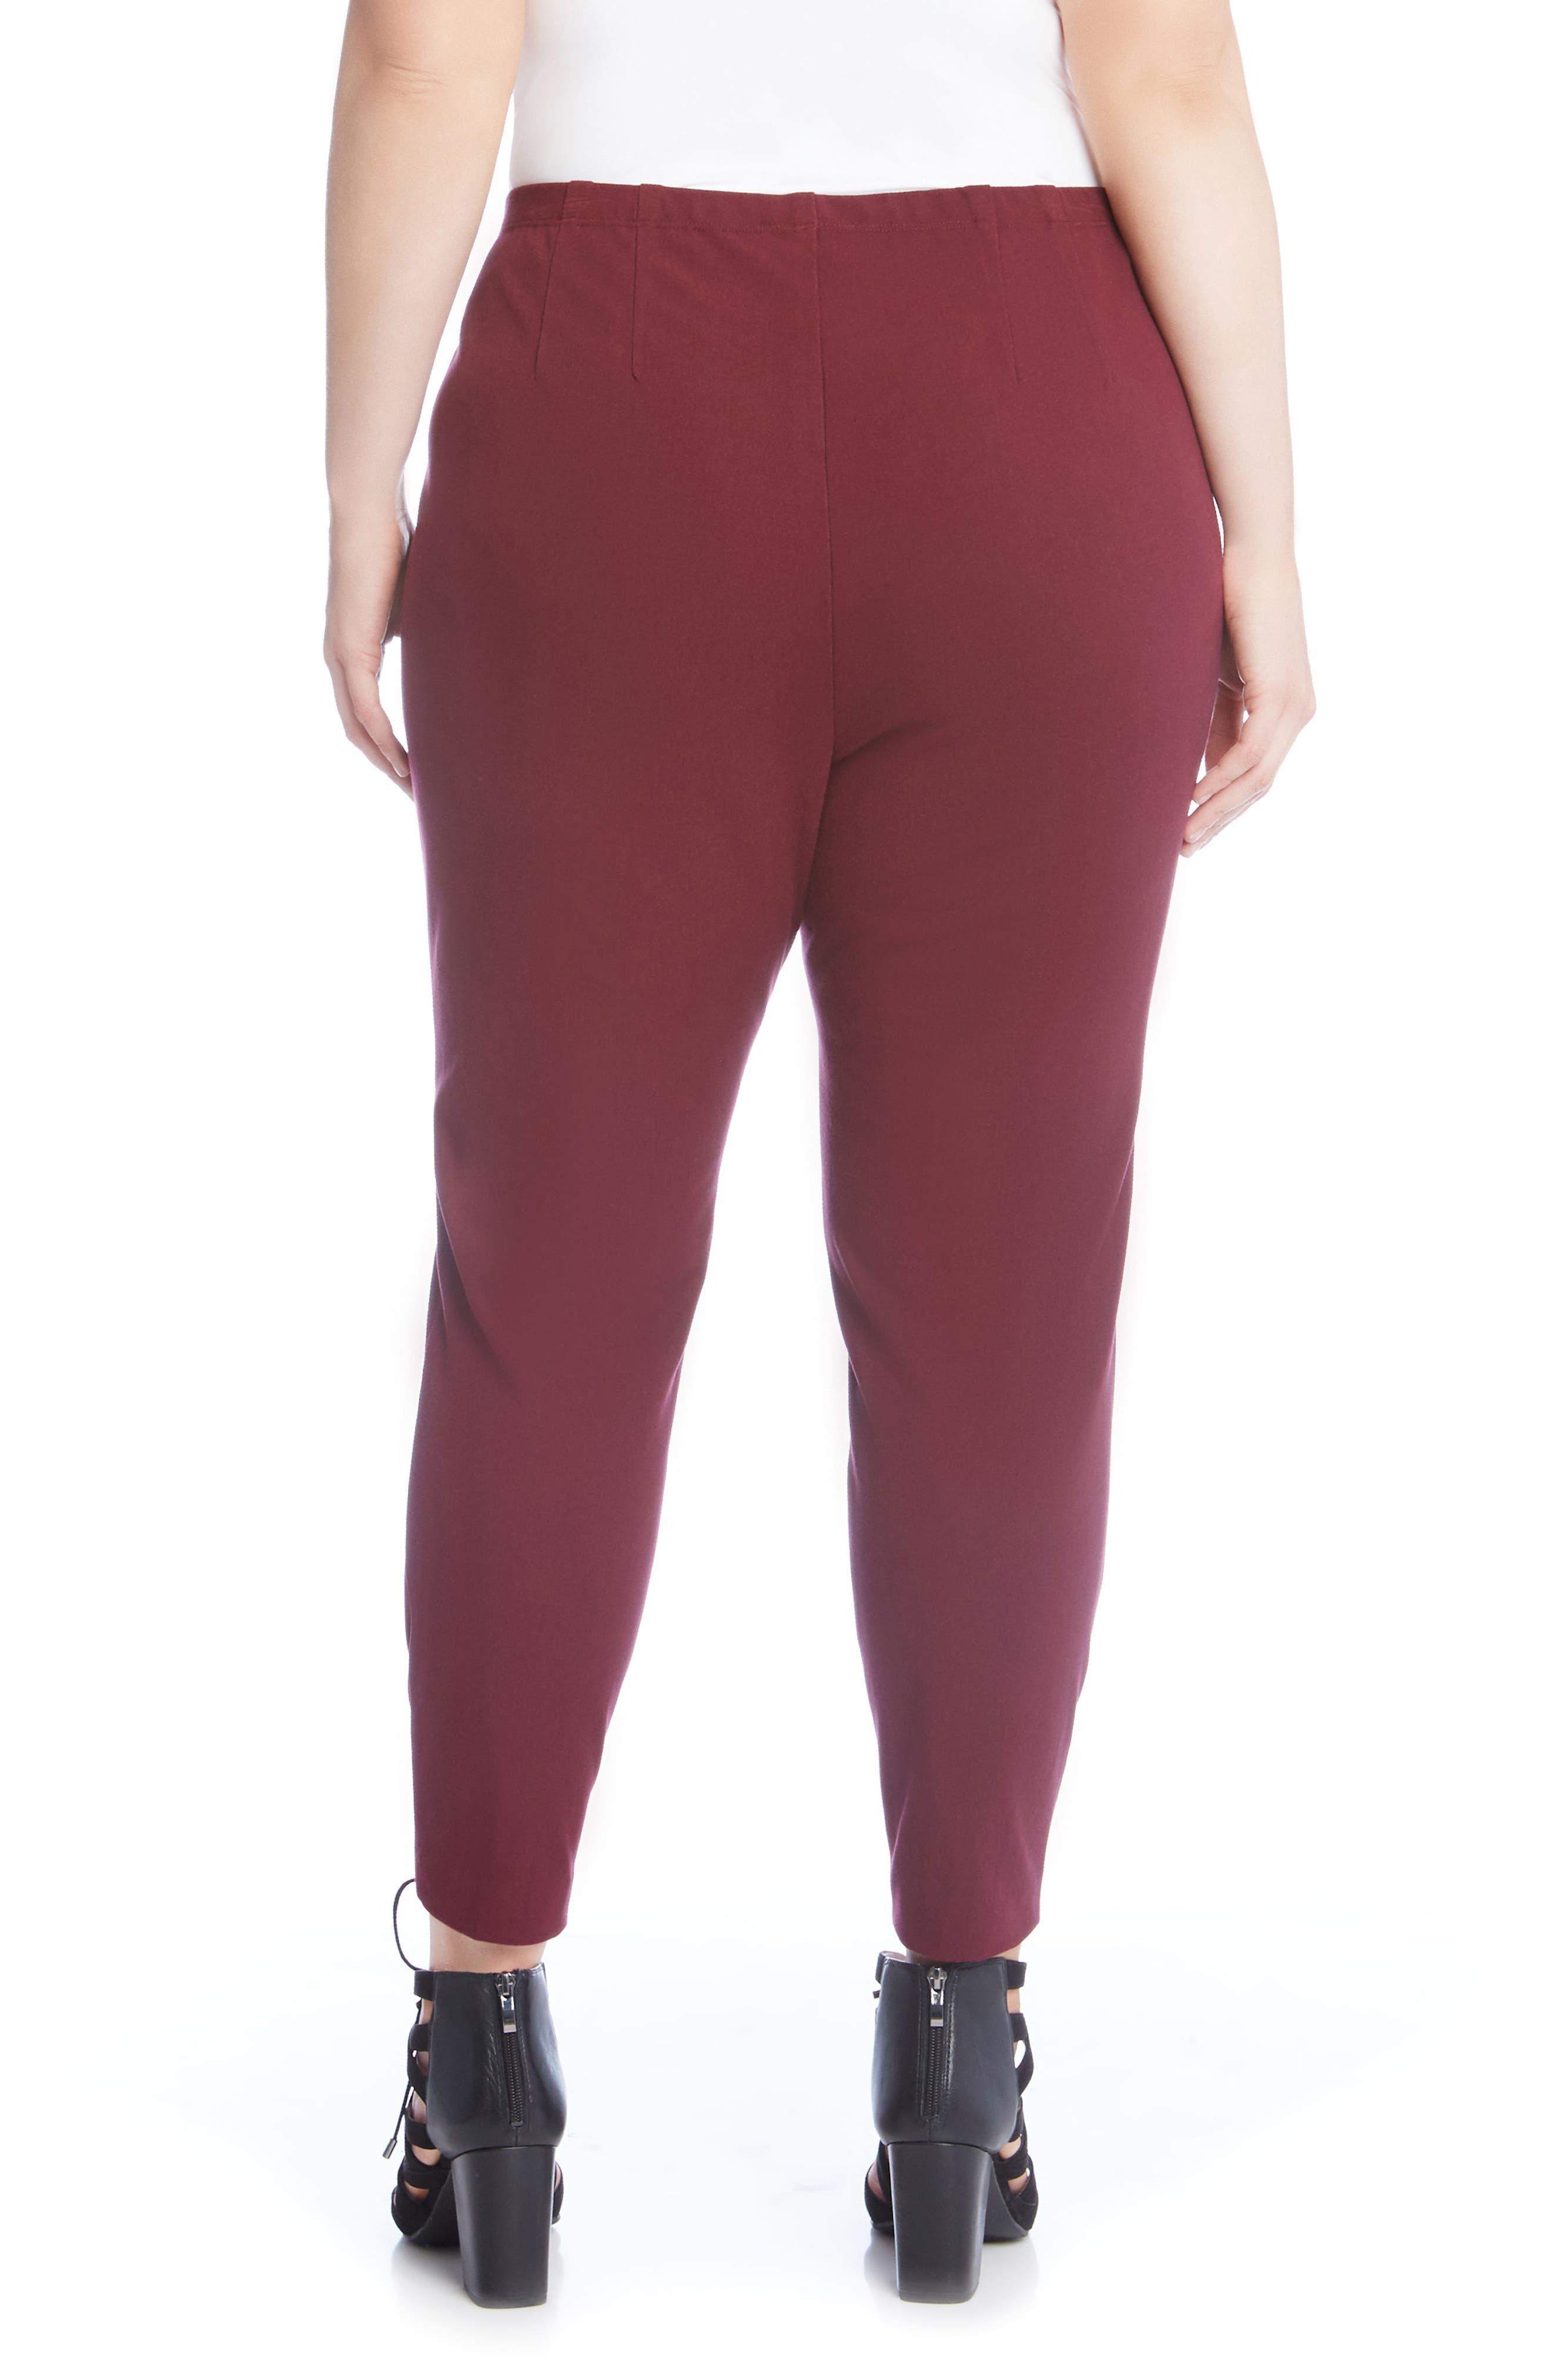 Piper High-Waist Pants,                             Alternate thumbnail 2, color,                             931